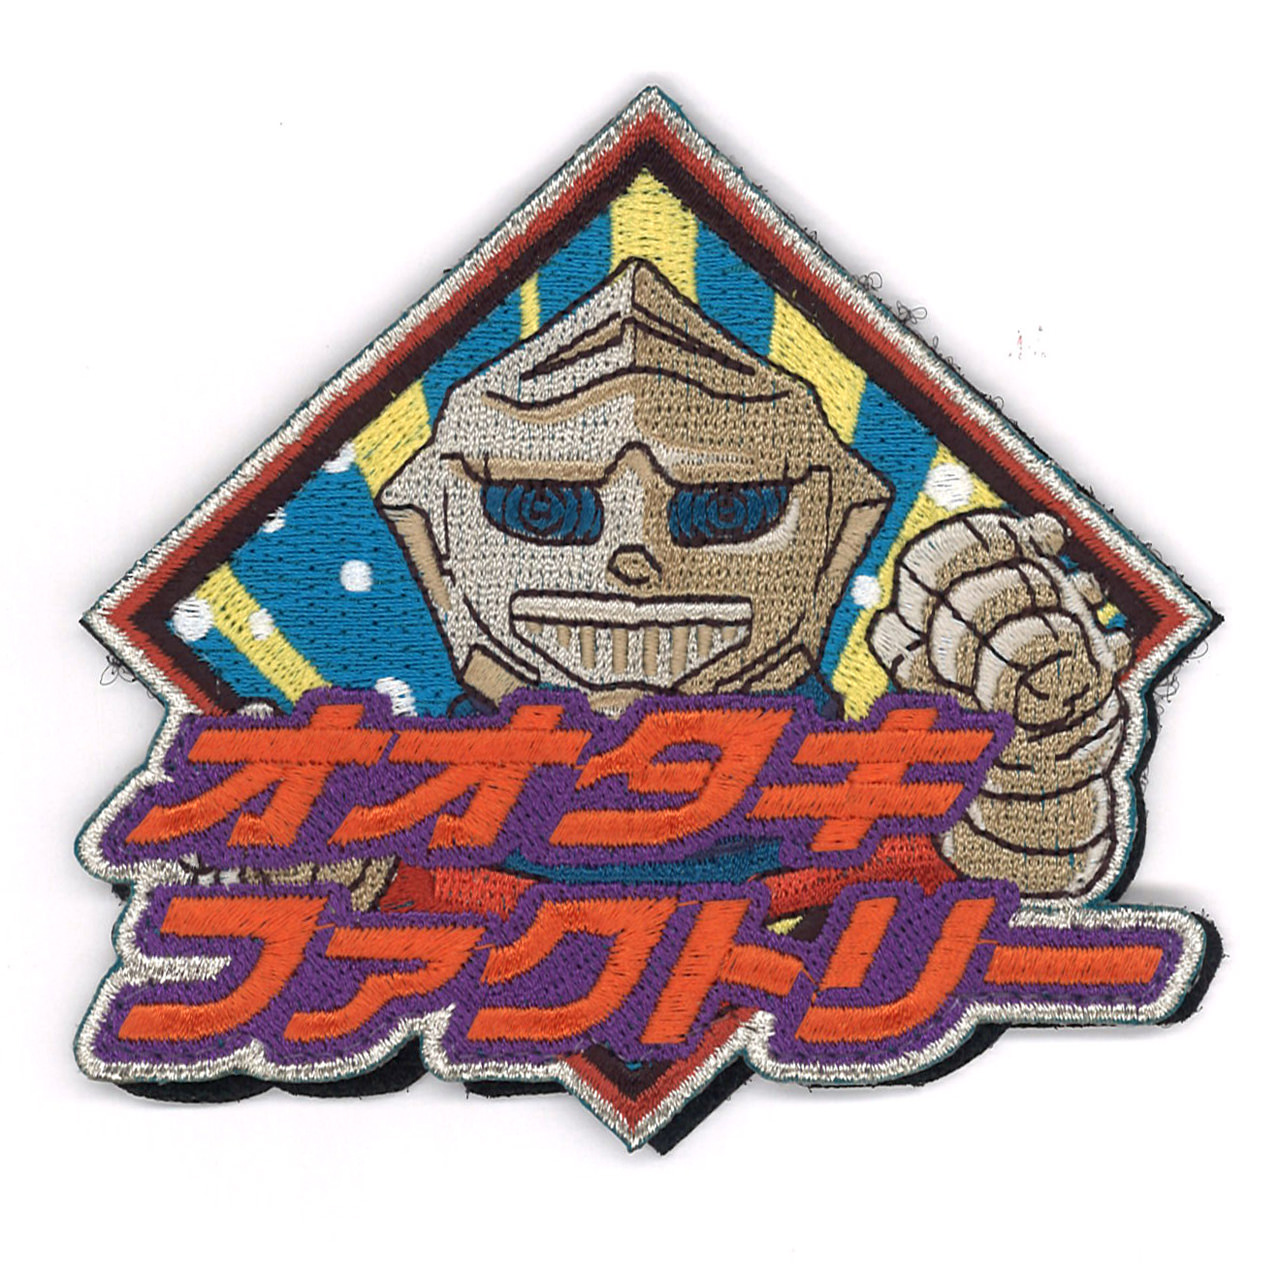 Godzilla sp v 11 04